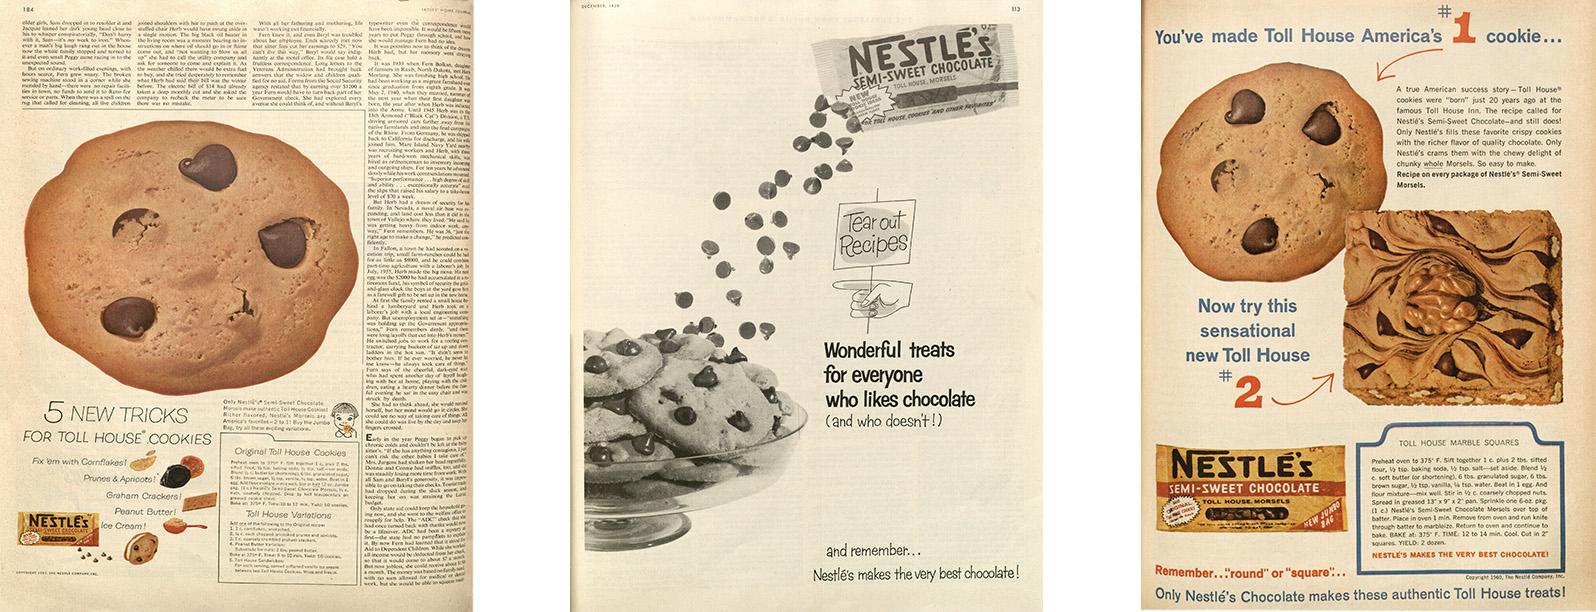 Nestle Magazine Ads - 1957, 1959 and 1960